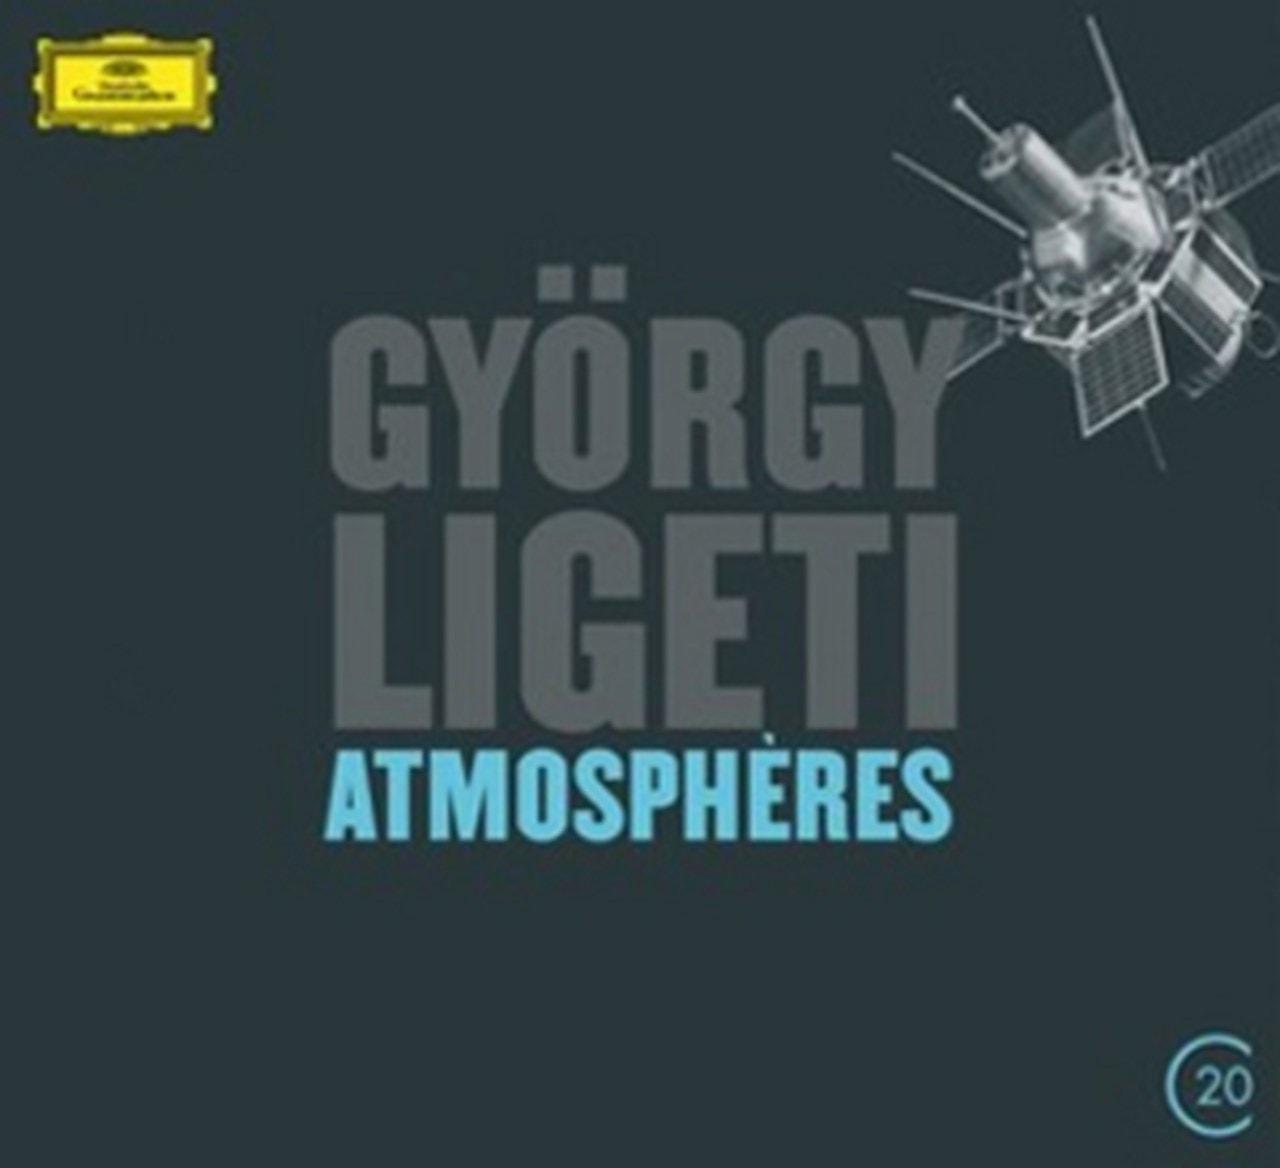 Gyorgy Ligeti: Atmospheres - 1